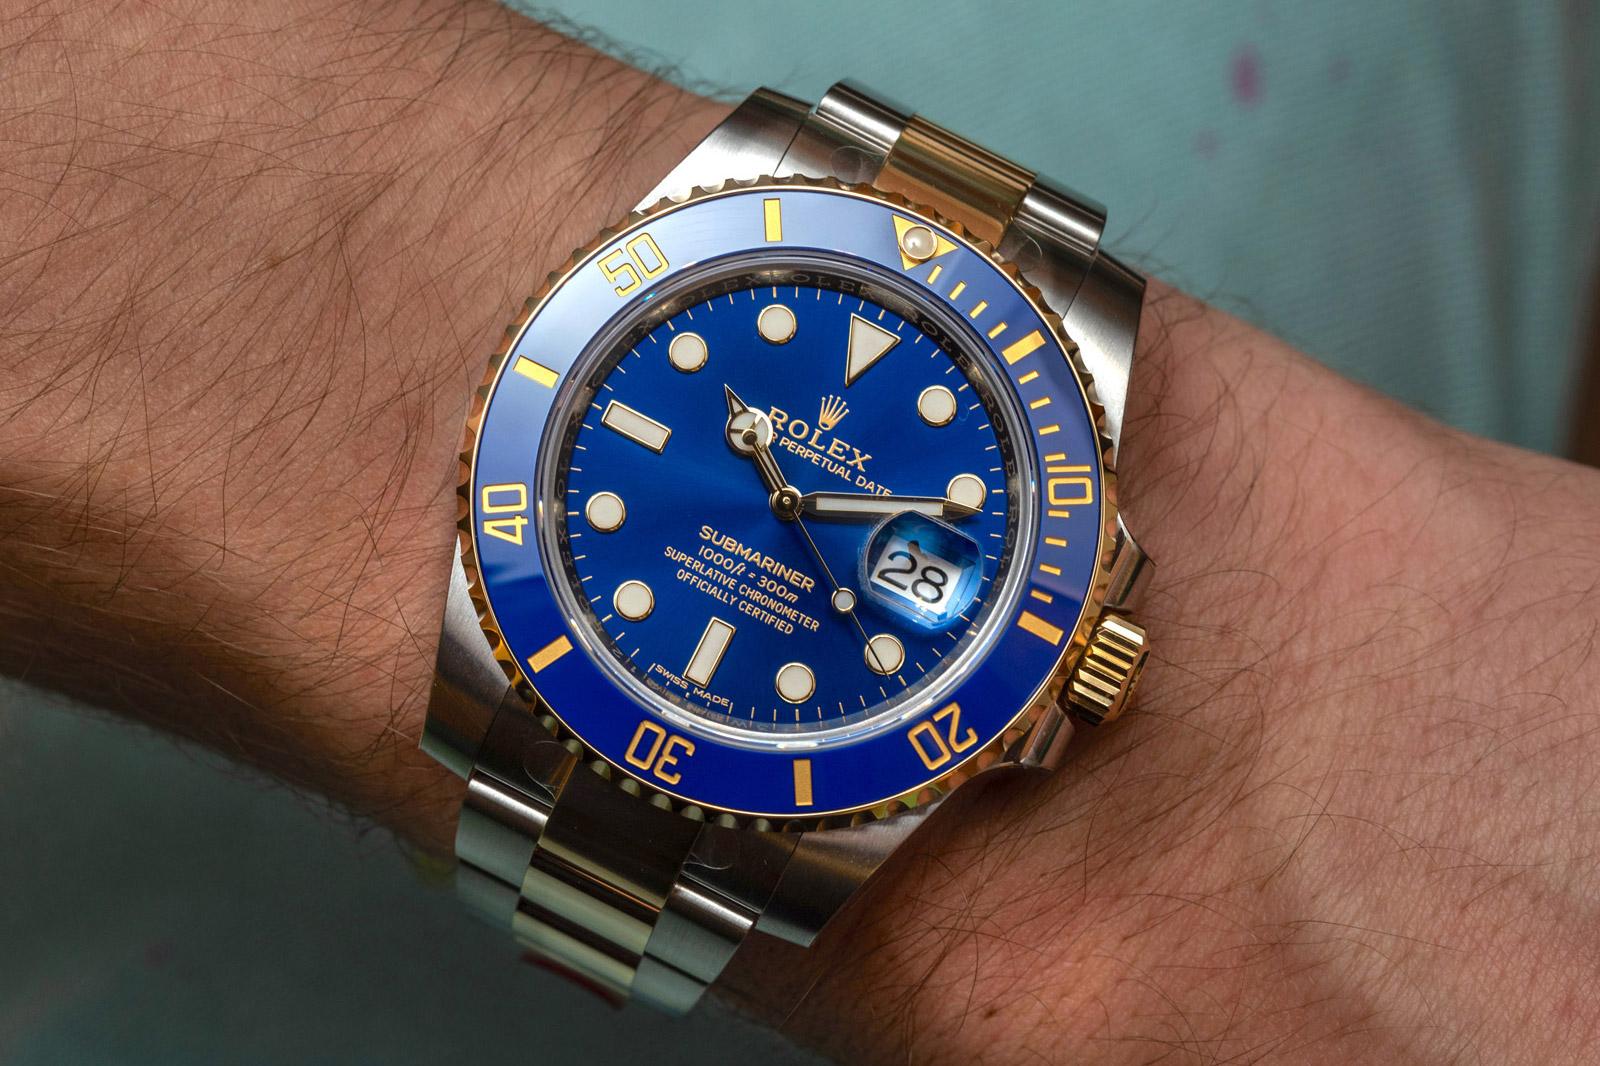 Rolex Submariner Date <br> Referenca 116613LB